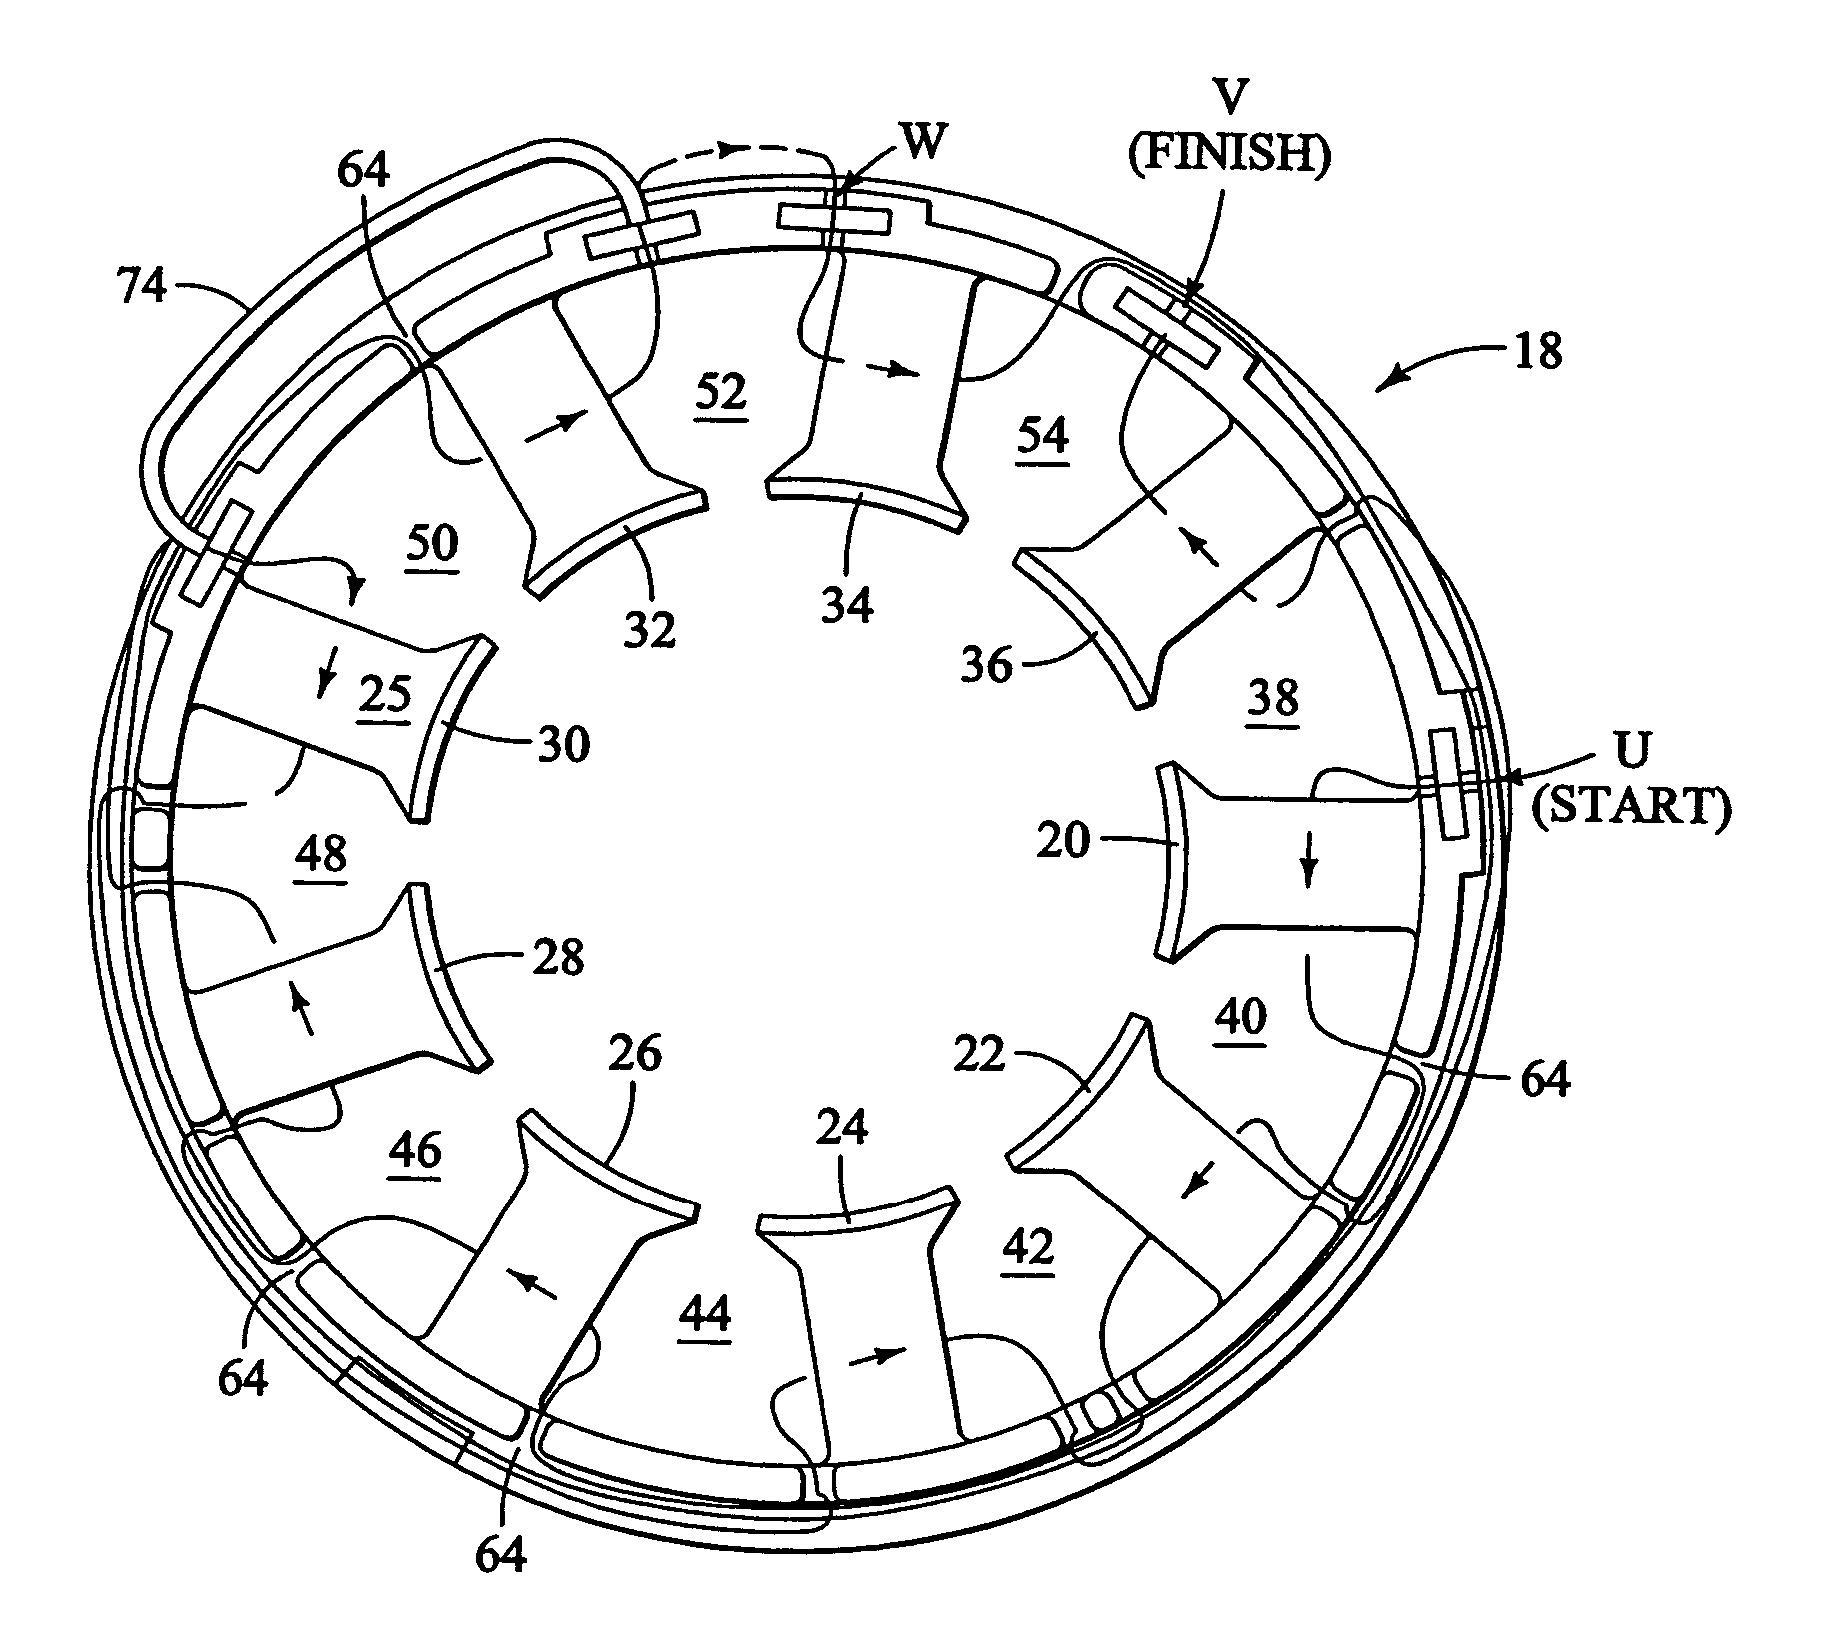 3 Phase Electric Motor Starter Wiring Diagram from schematron.org